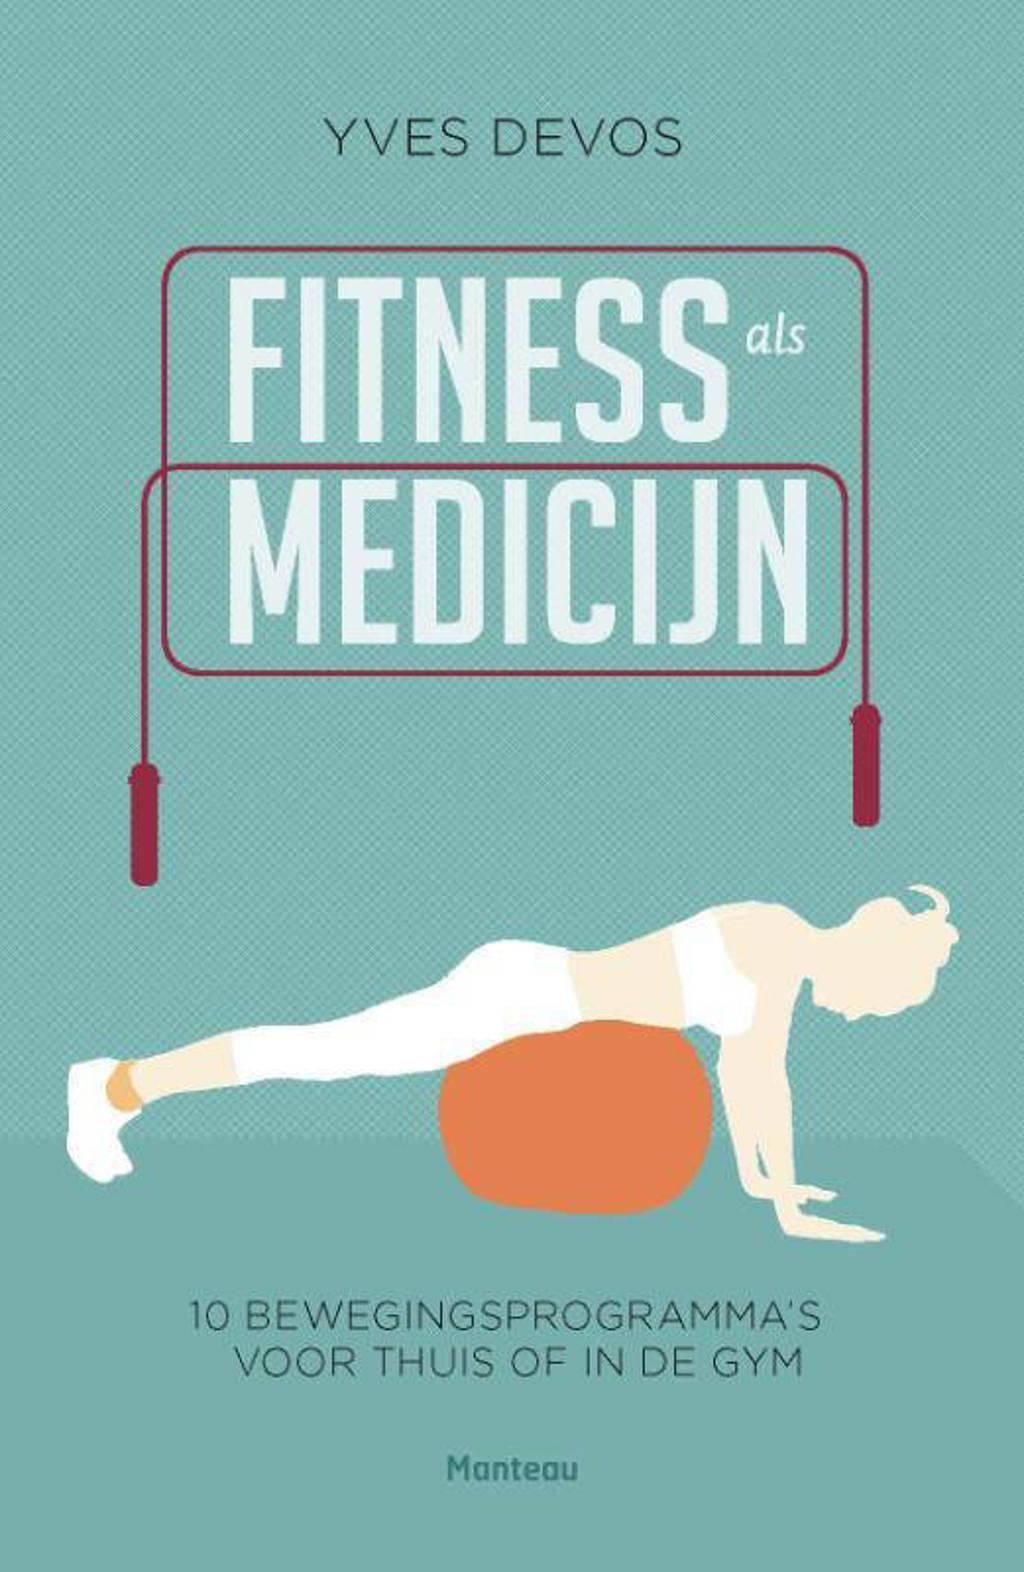 Fitness als medicijn - Yves Devos